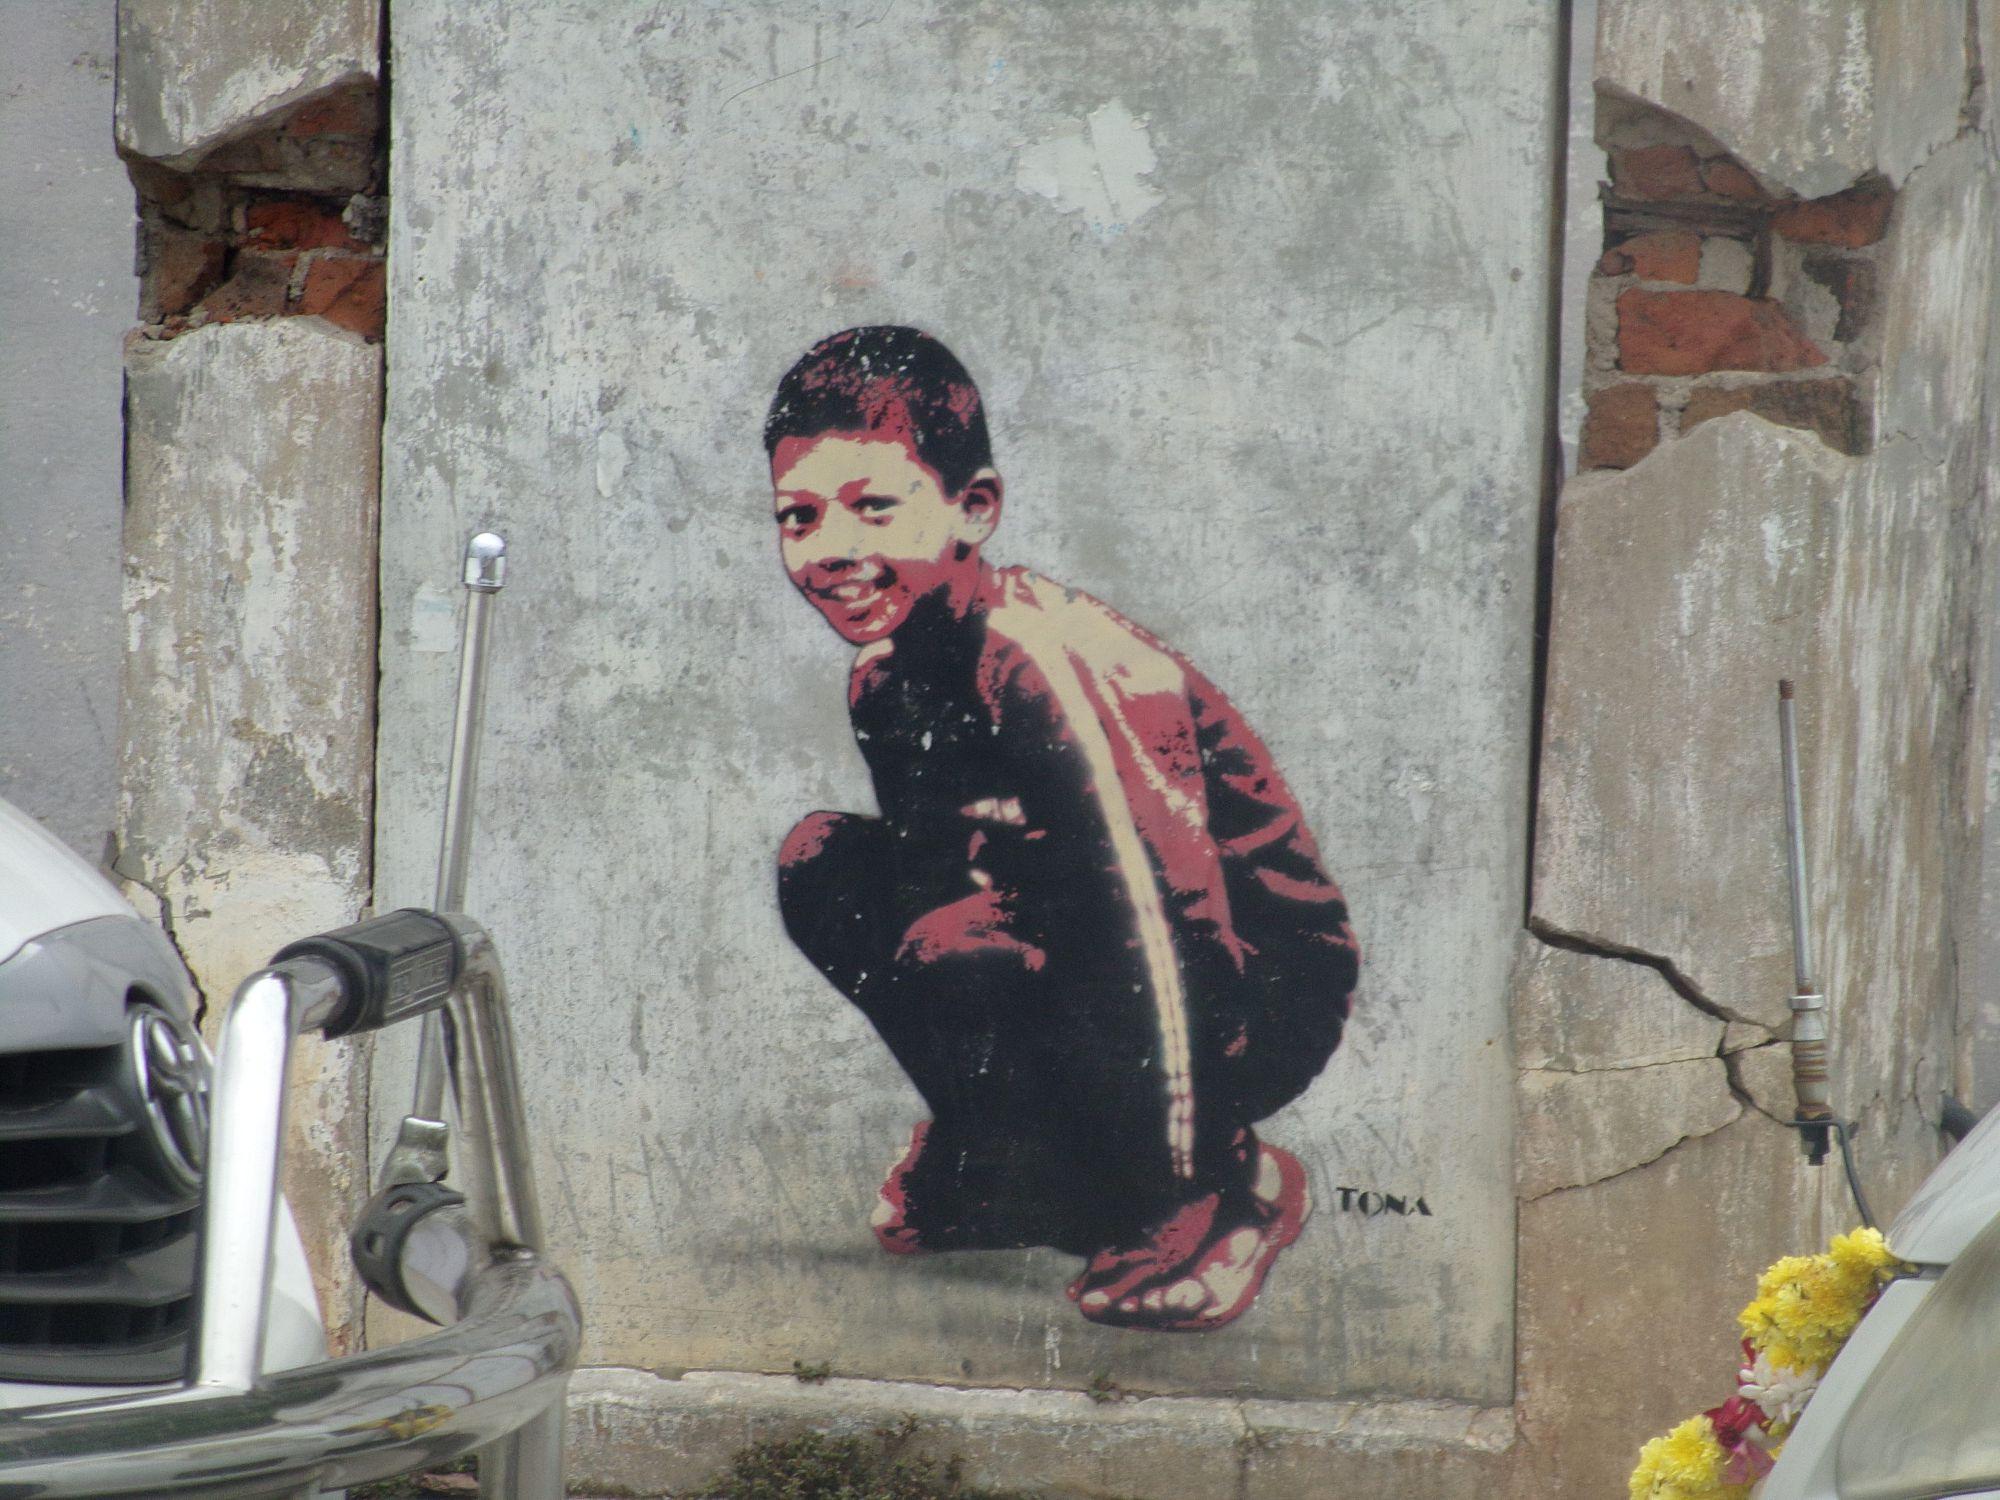 street art pondicherry tona promenade